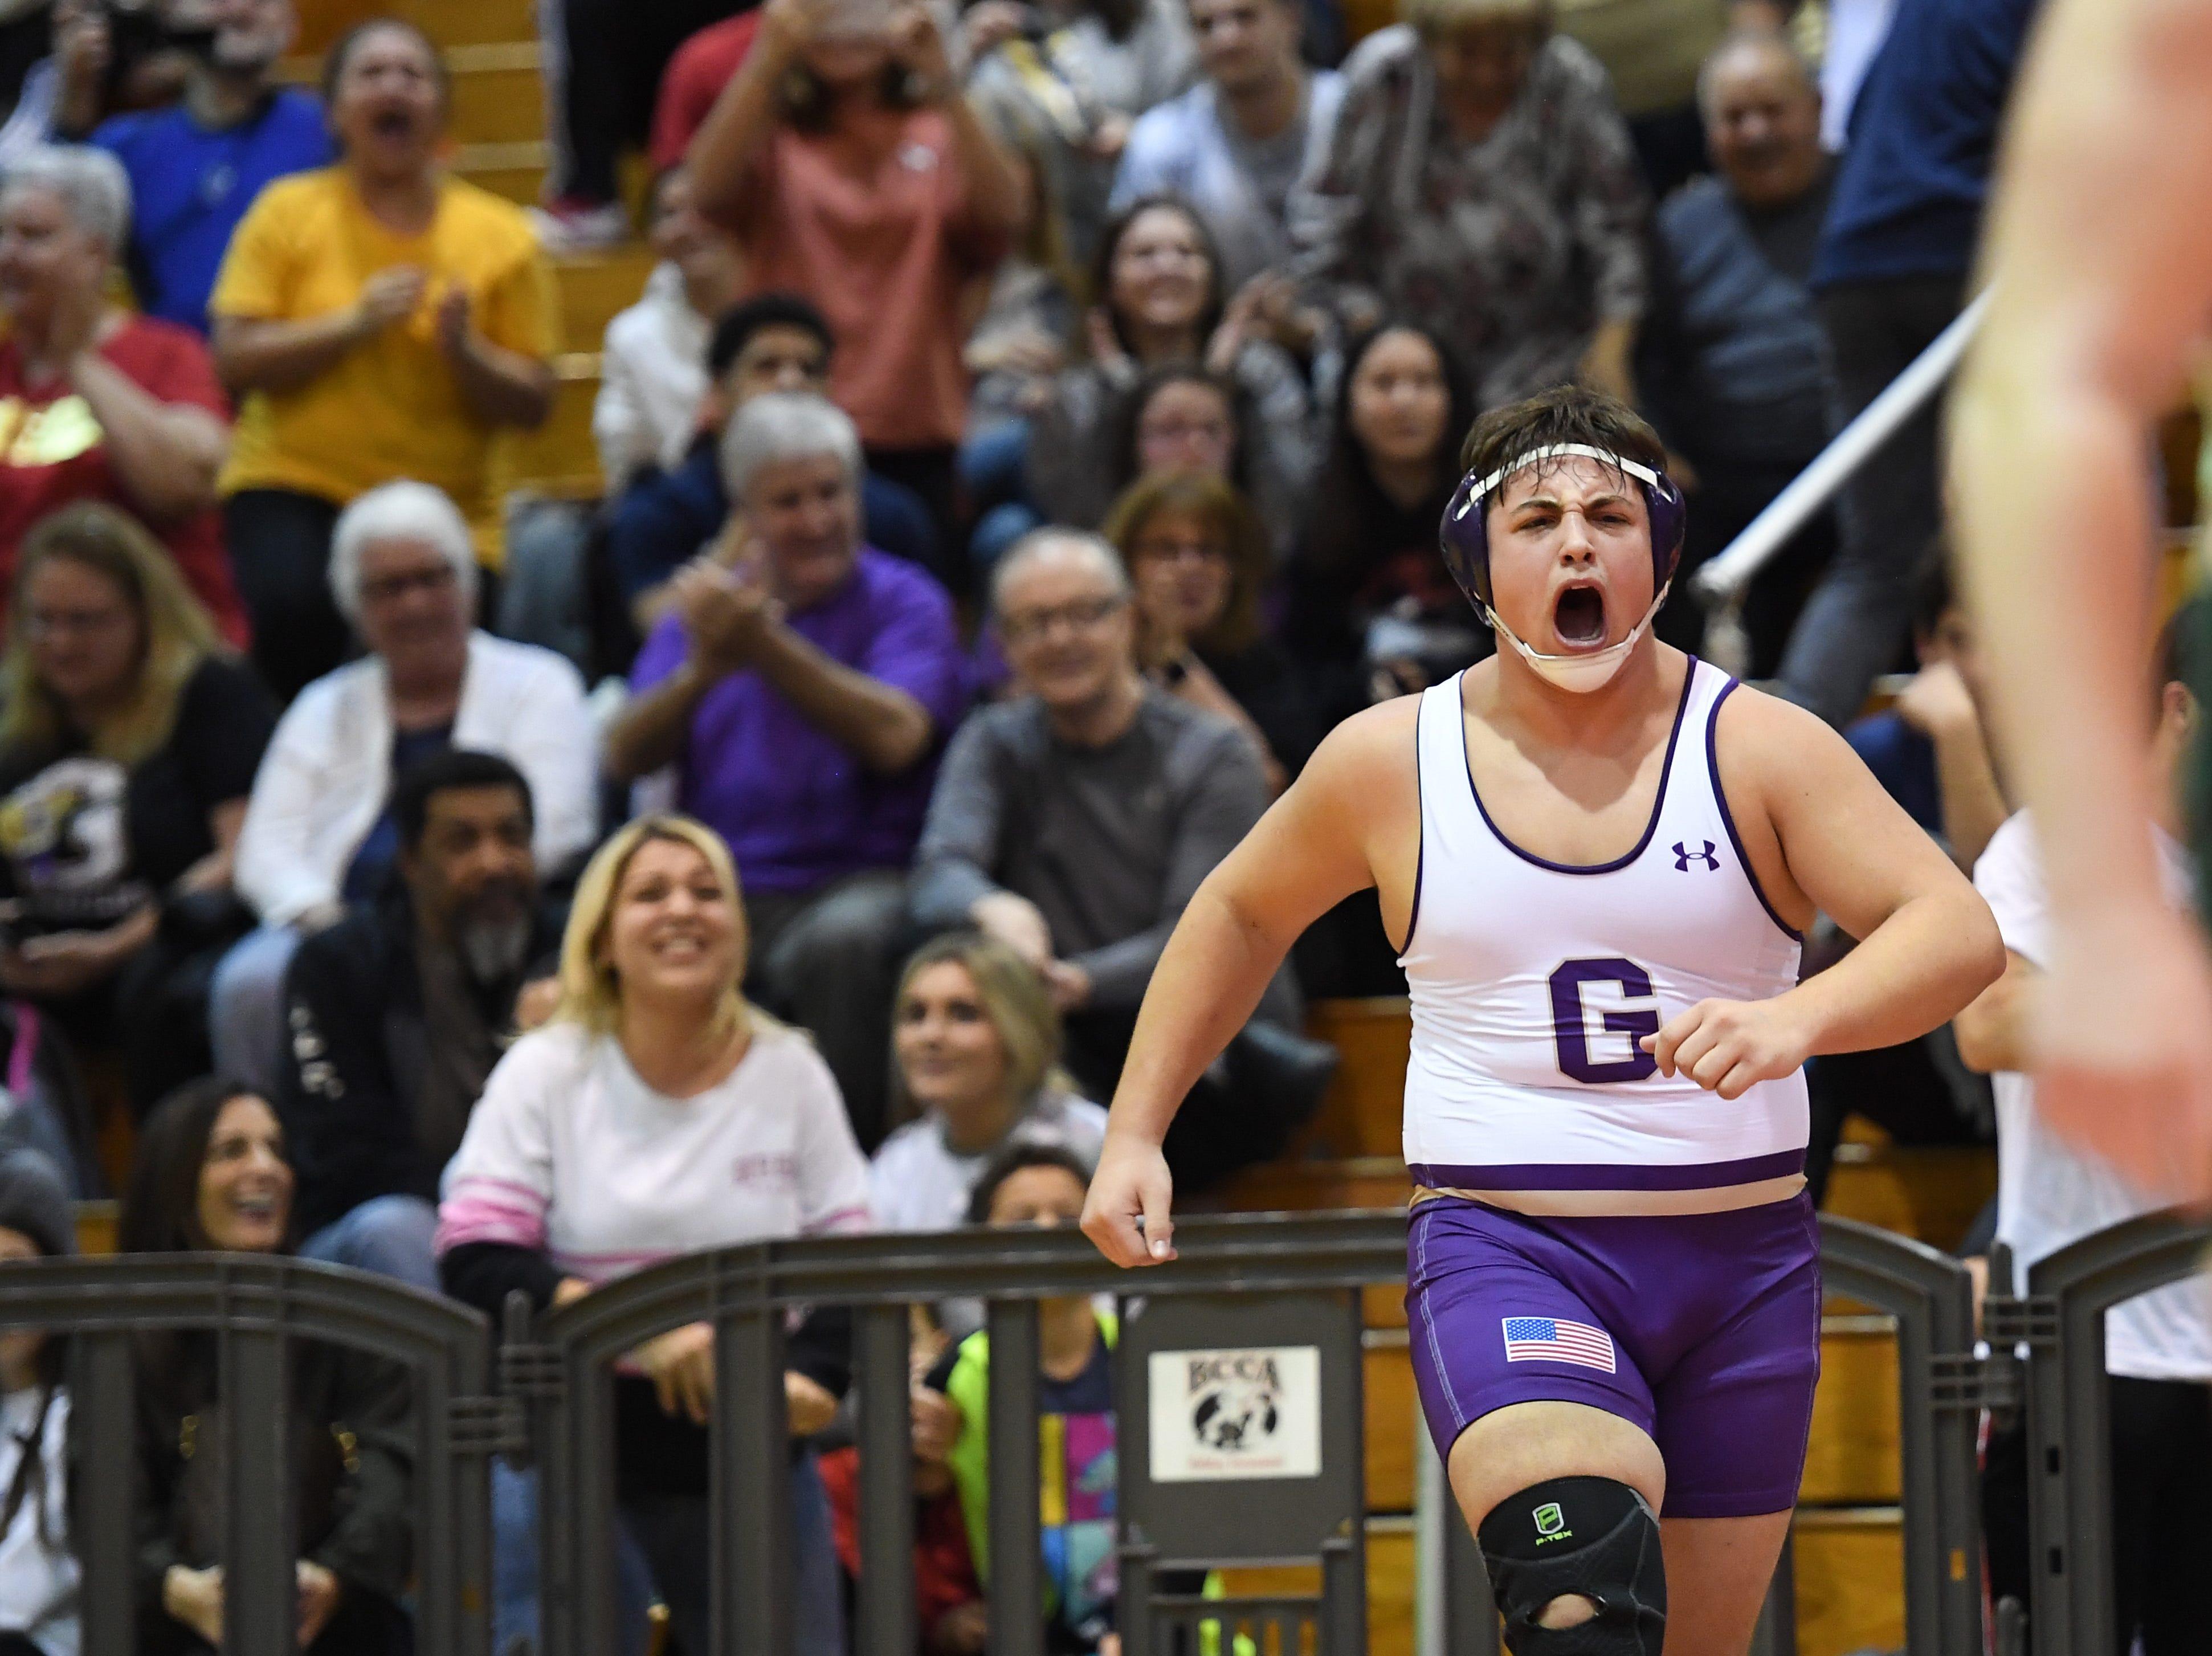 Bergen County wrestling finals at Hackensack High School on Friday, December 28, 2018. Michael Filieri (Garfield) celebrates winning his 220 pound match.